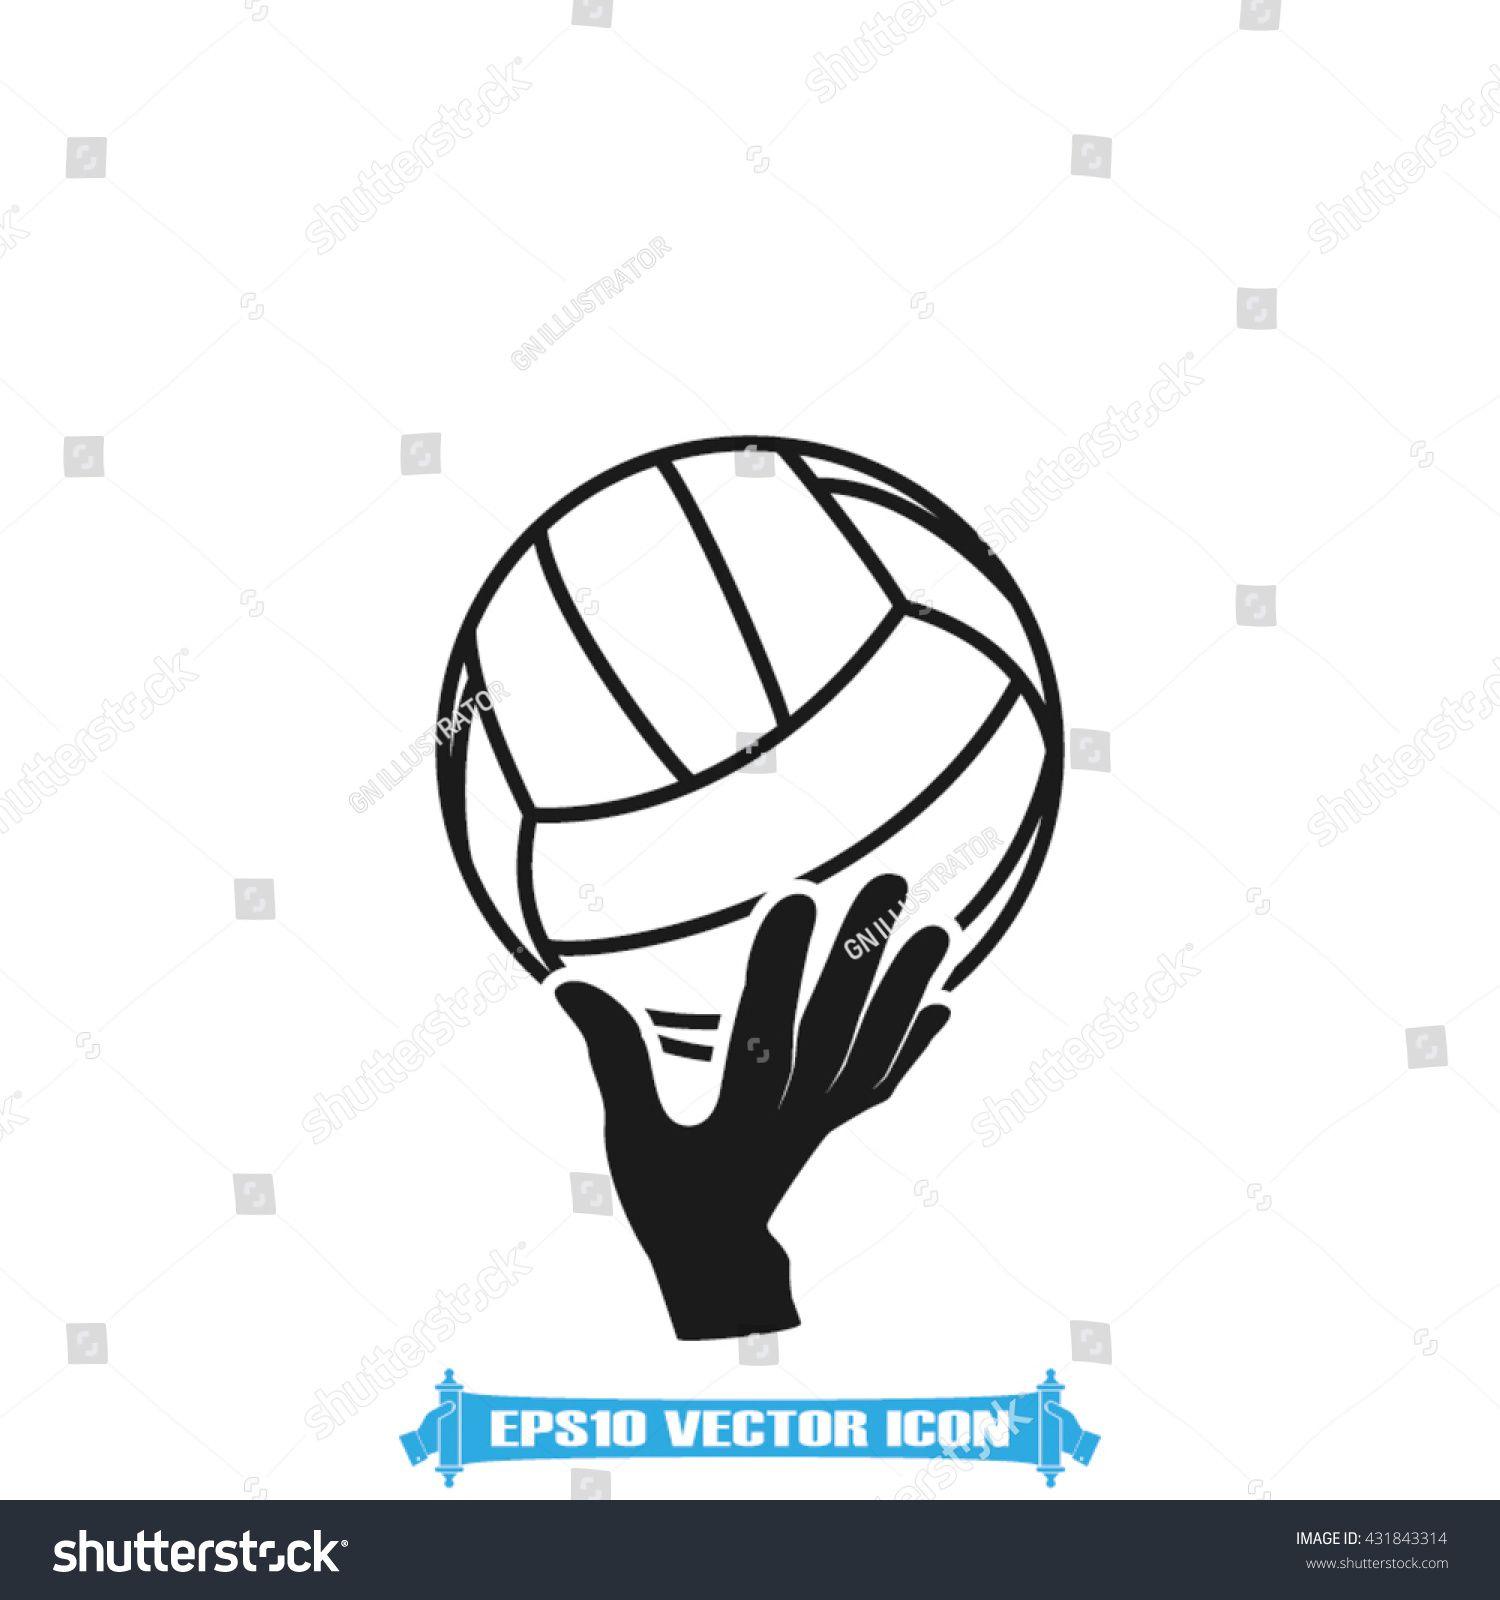 Volley Ball Vector Icon Illustration Design N Ad Ad Vector Ball Volley Designn In 2020 Vector Icons Illustration Illustration Design Modern Graphic Design